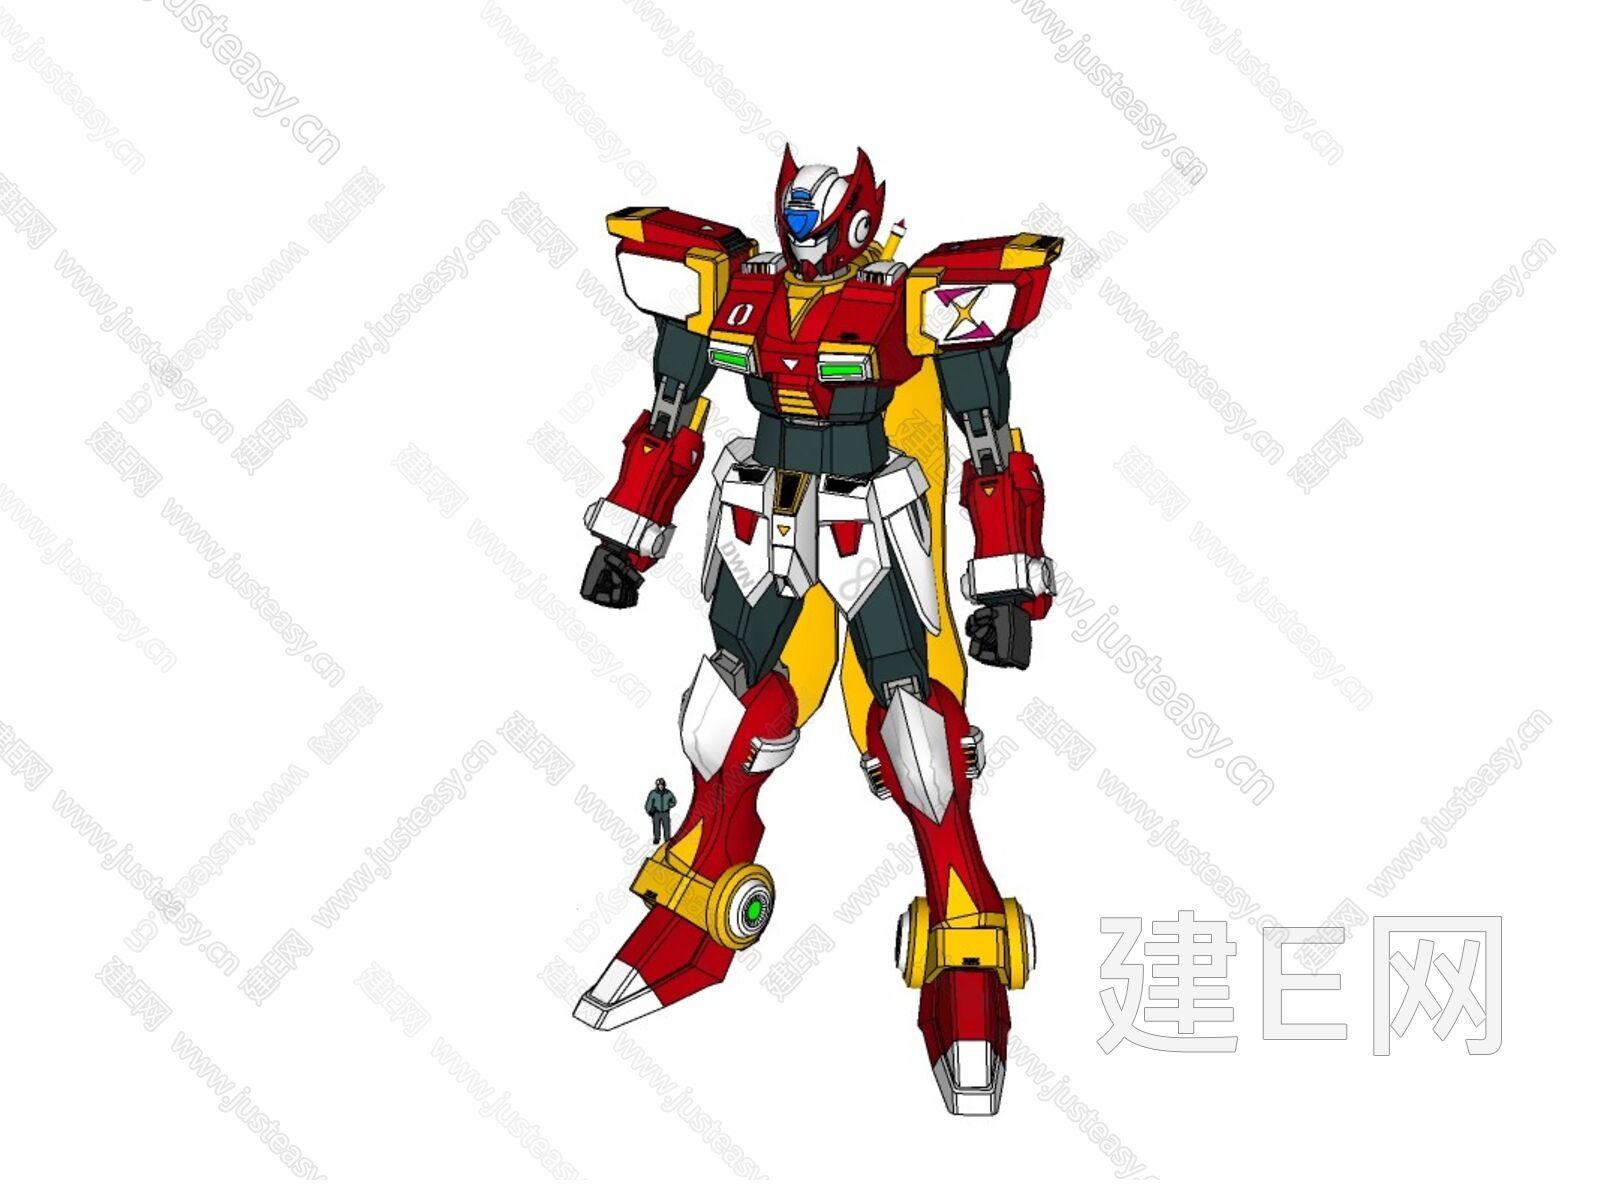 su模型首页 景观 人物动物 动漫高达敢达铠甲勇士机器人[模型id:2368]